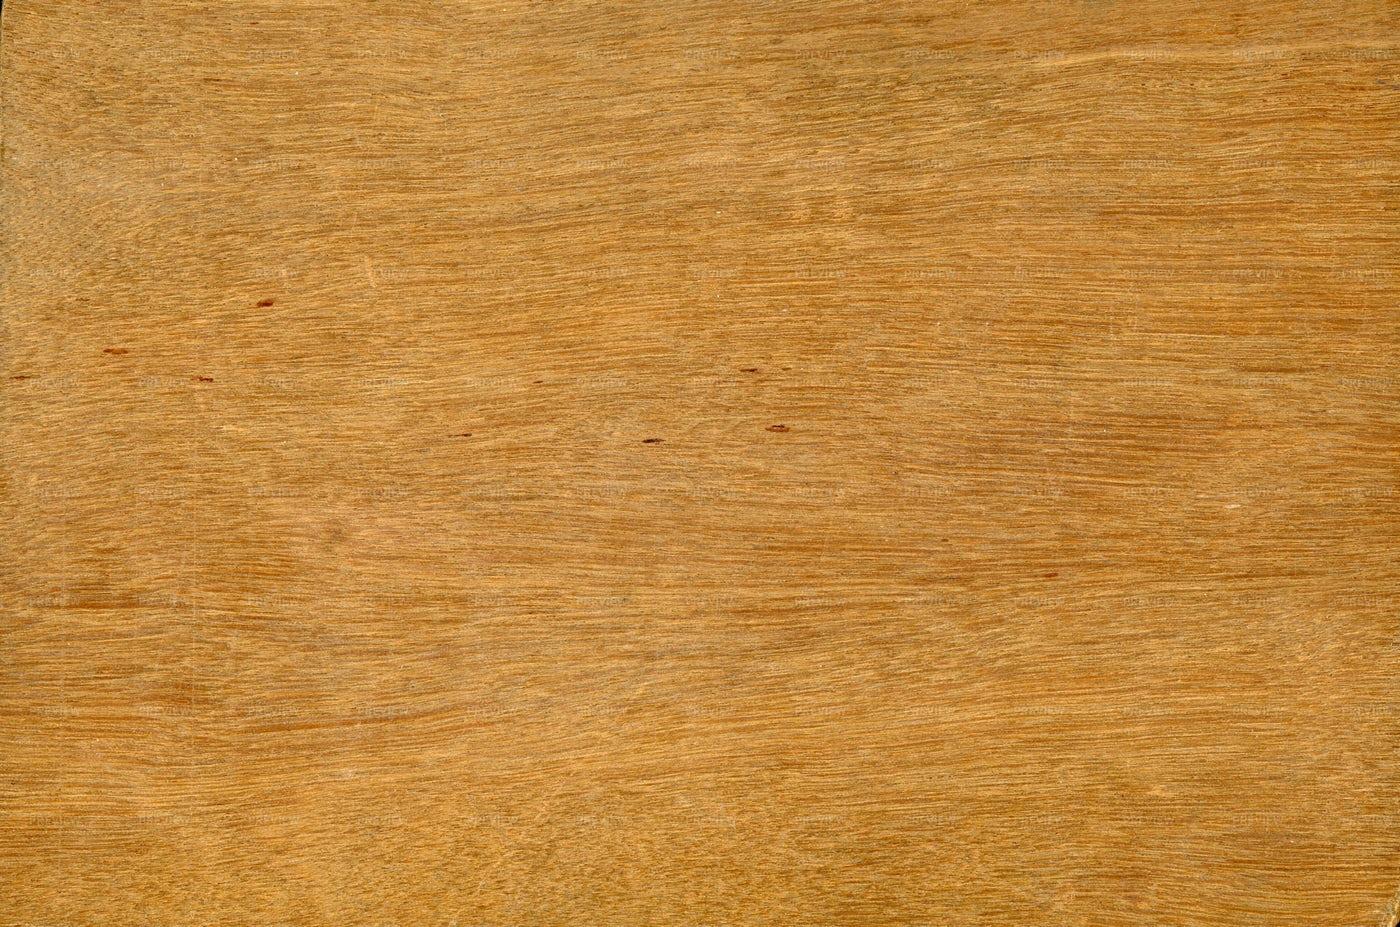 Light Wood Background: Stock Photos